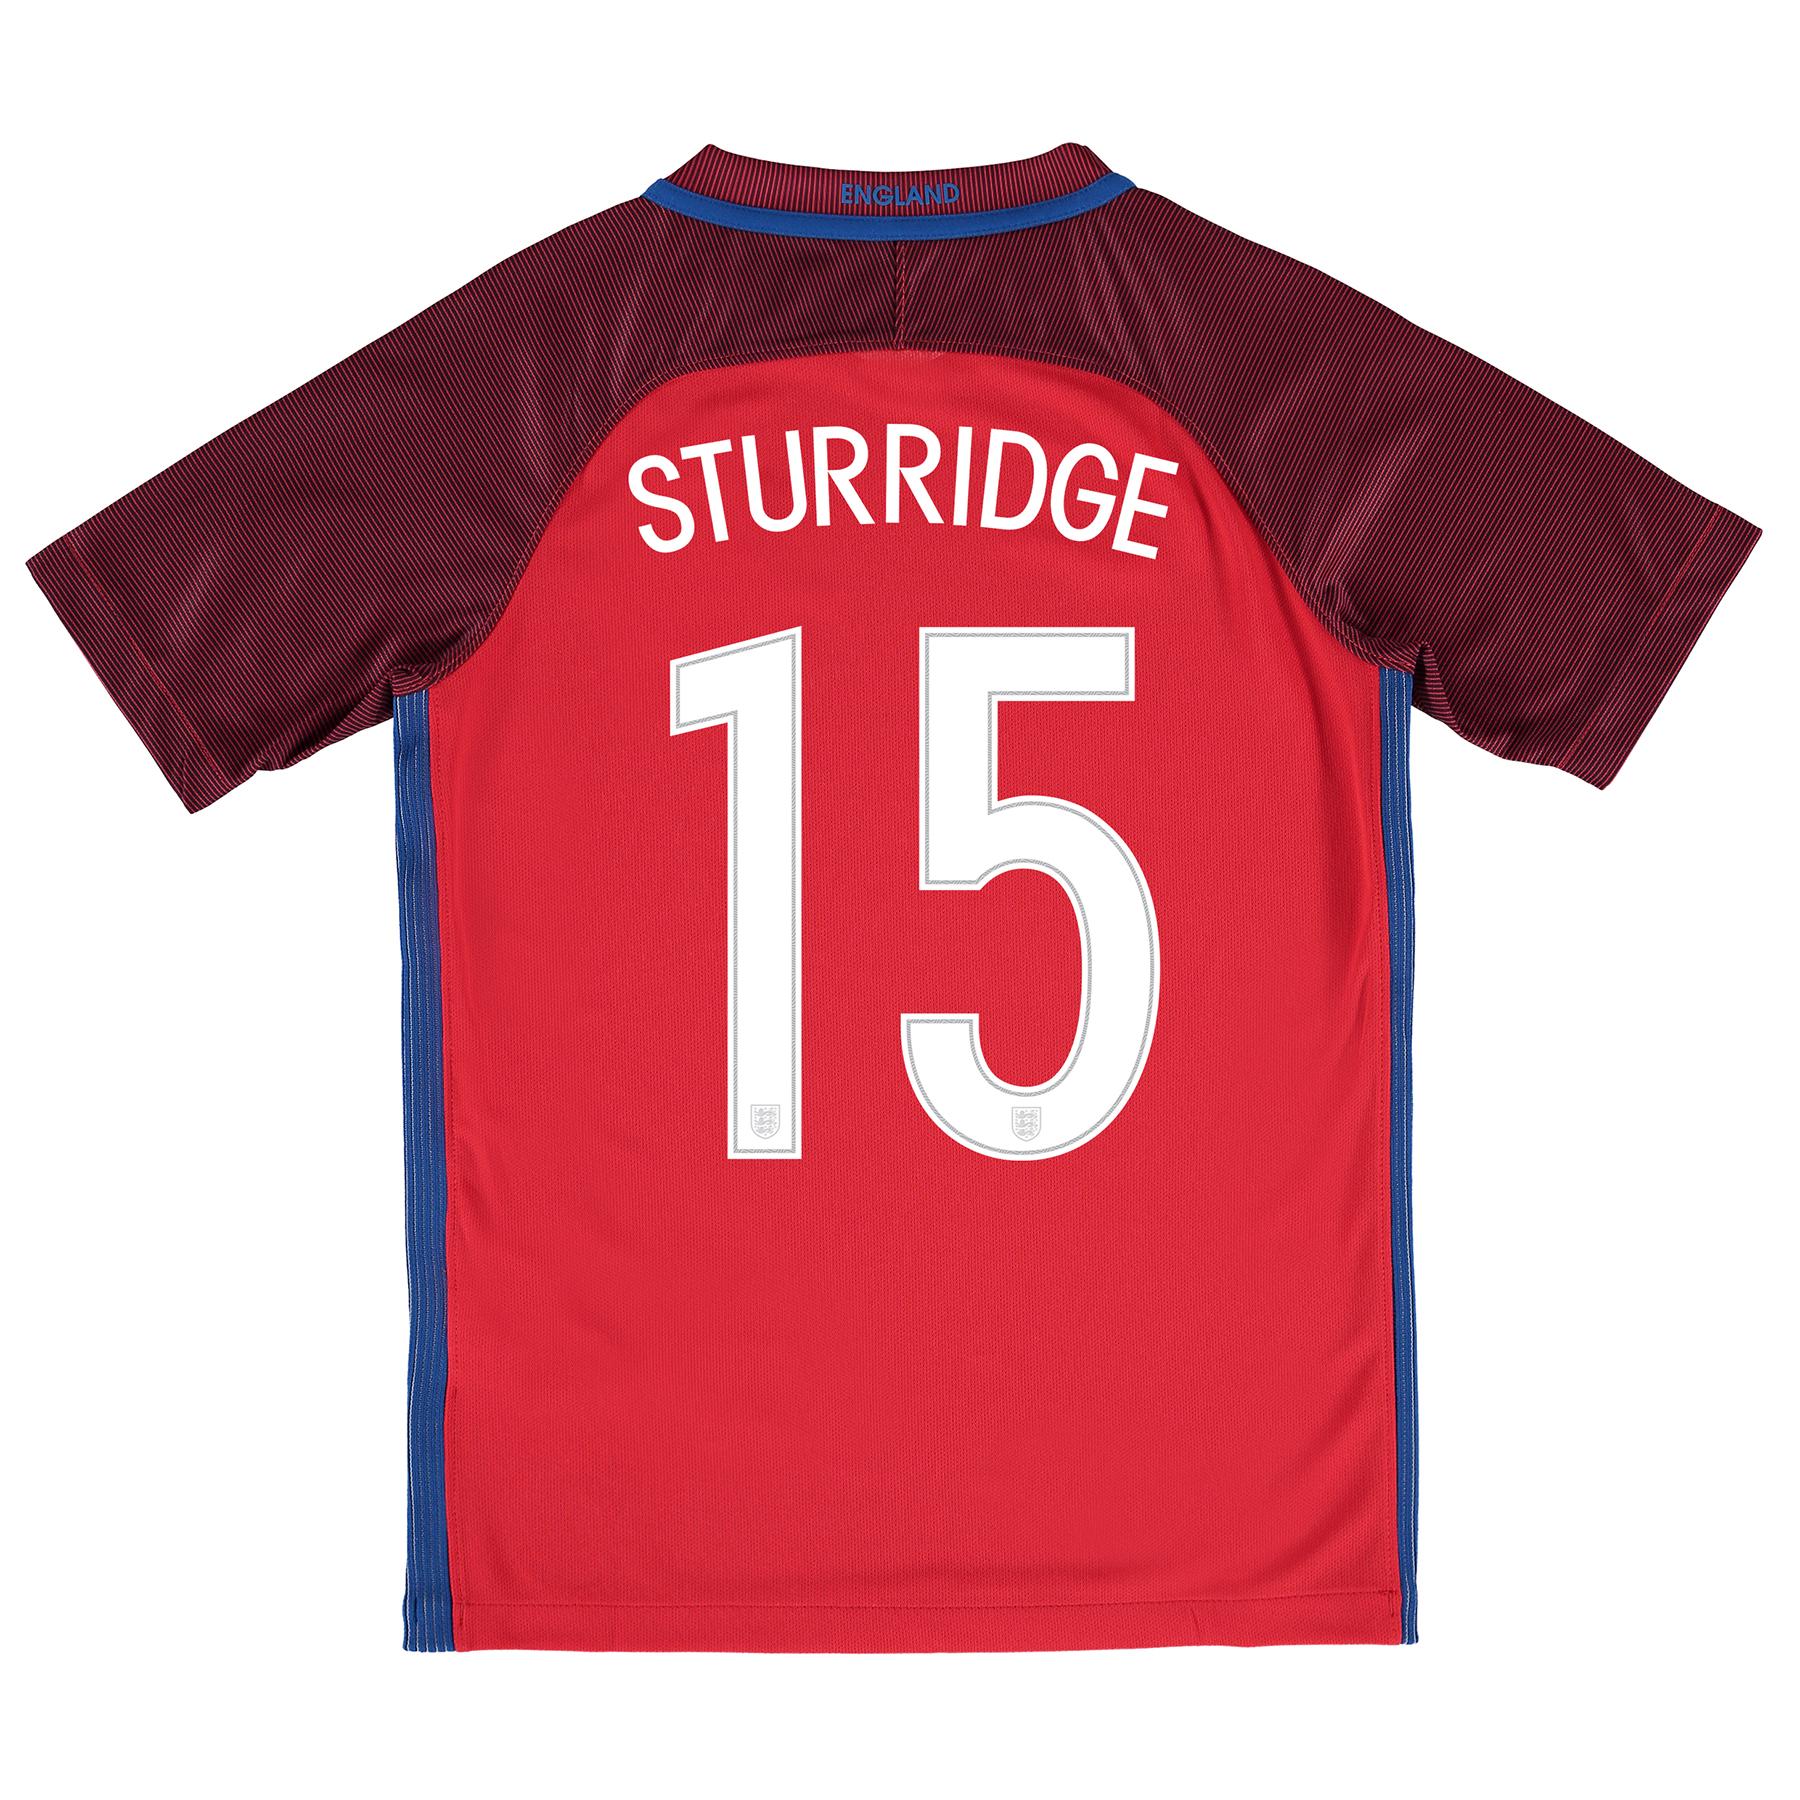 Image of England Away Shirt 2016 - Kids with Sturridge 15 printing, Red